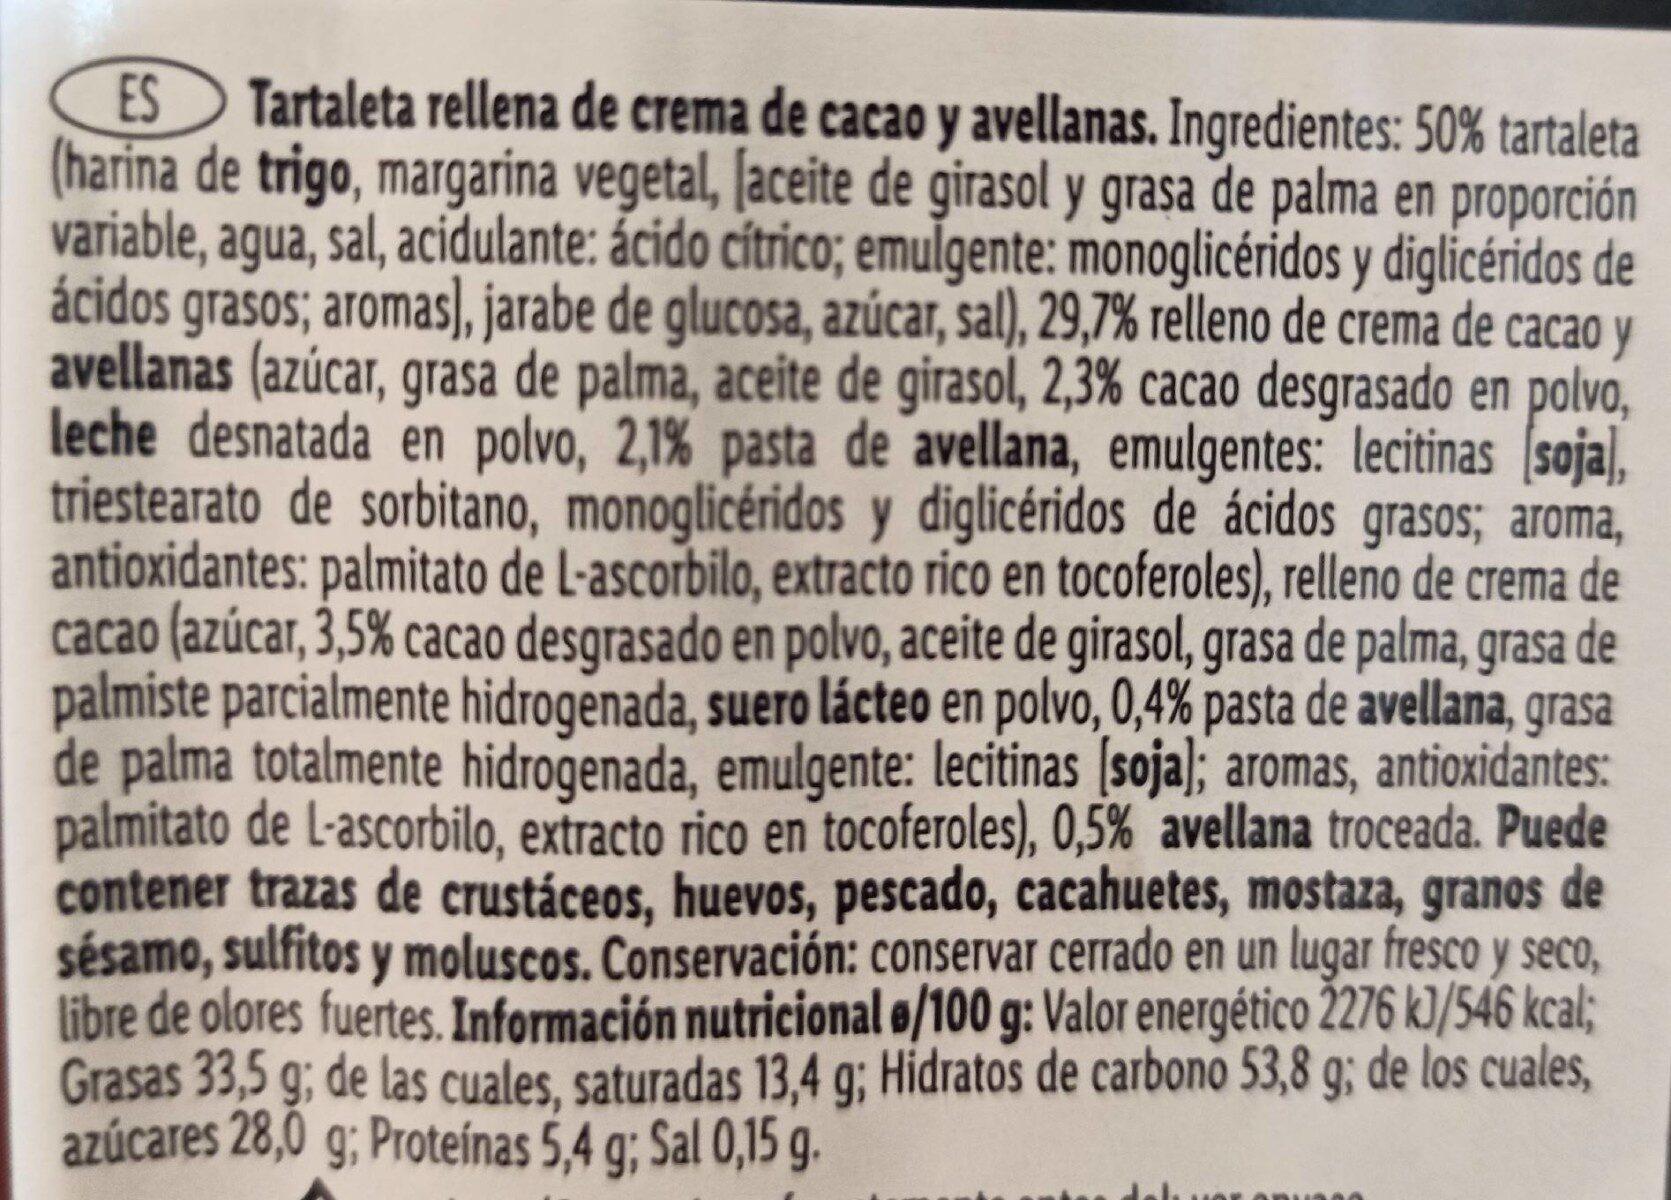 Crema de cacao avellana - Valori nutrizionali - es